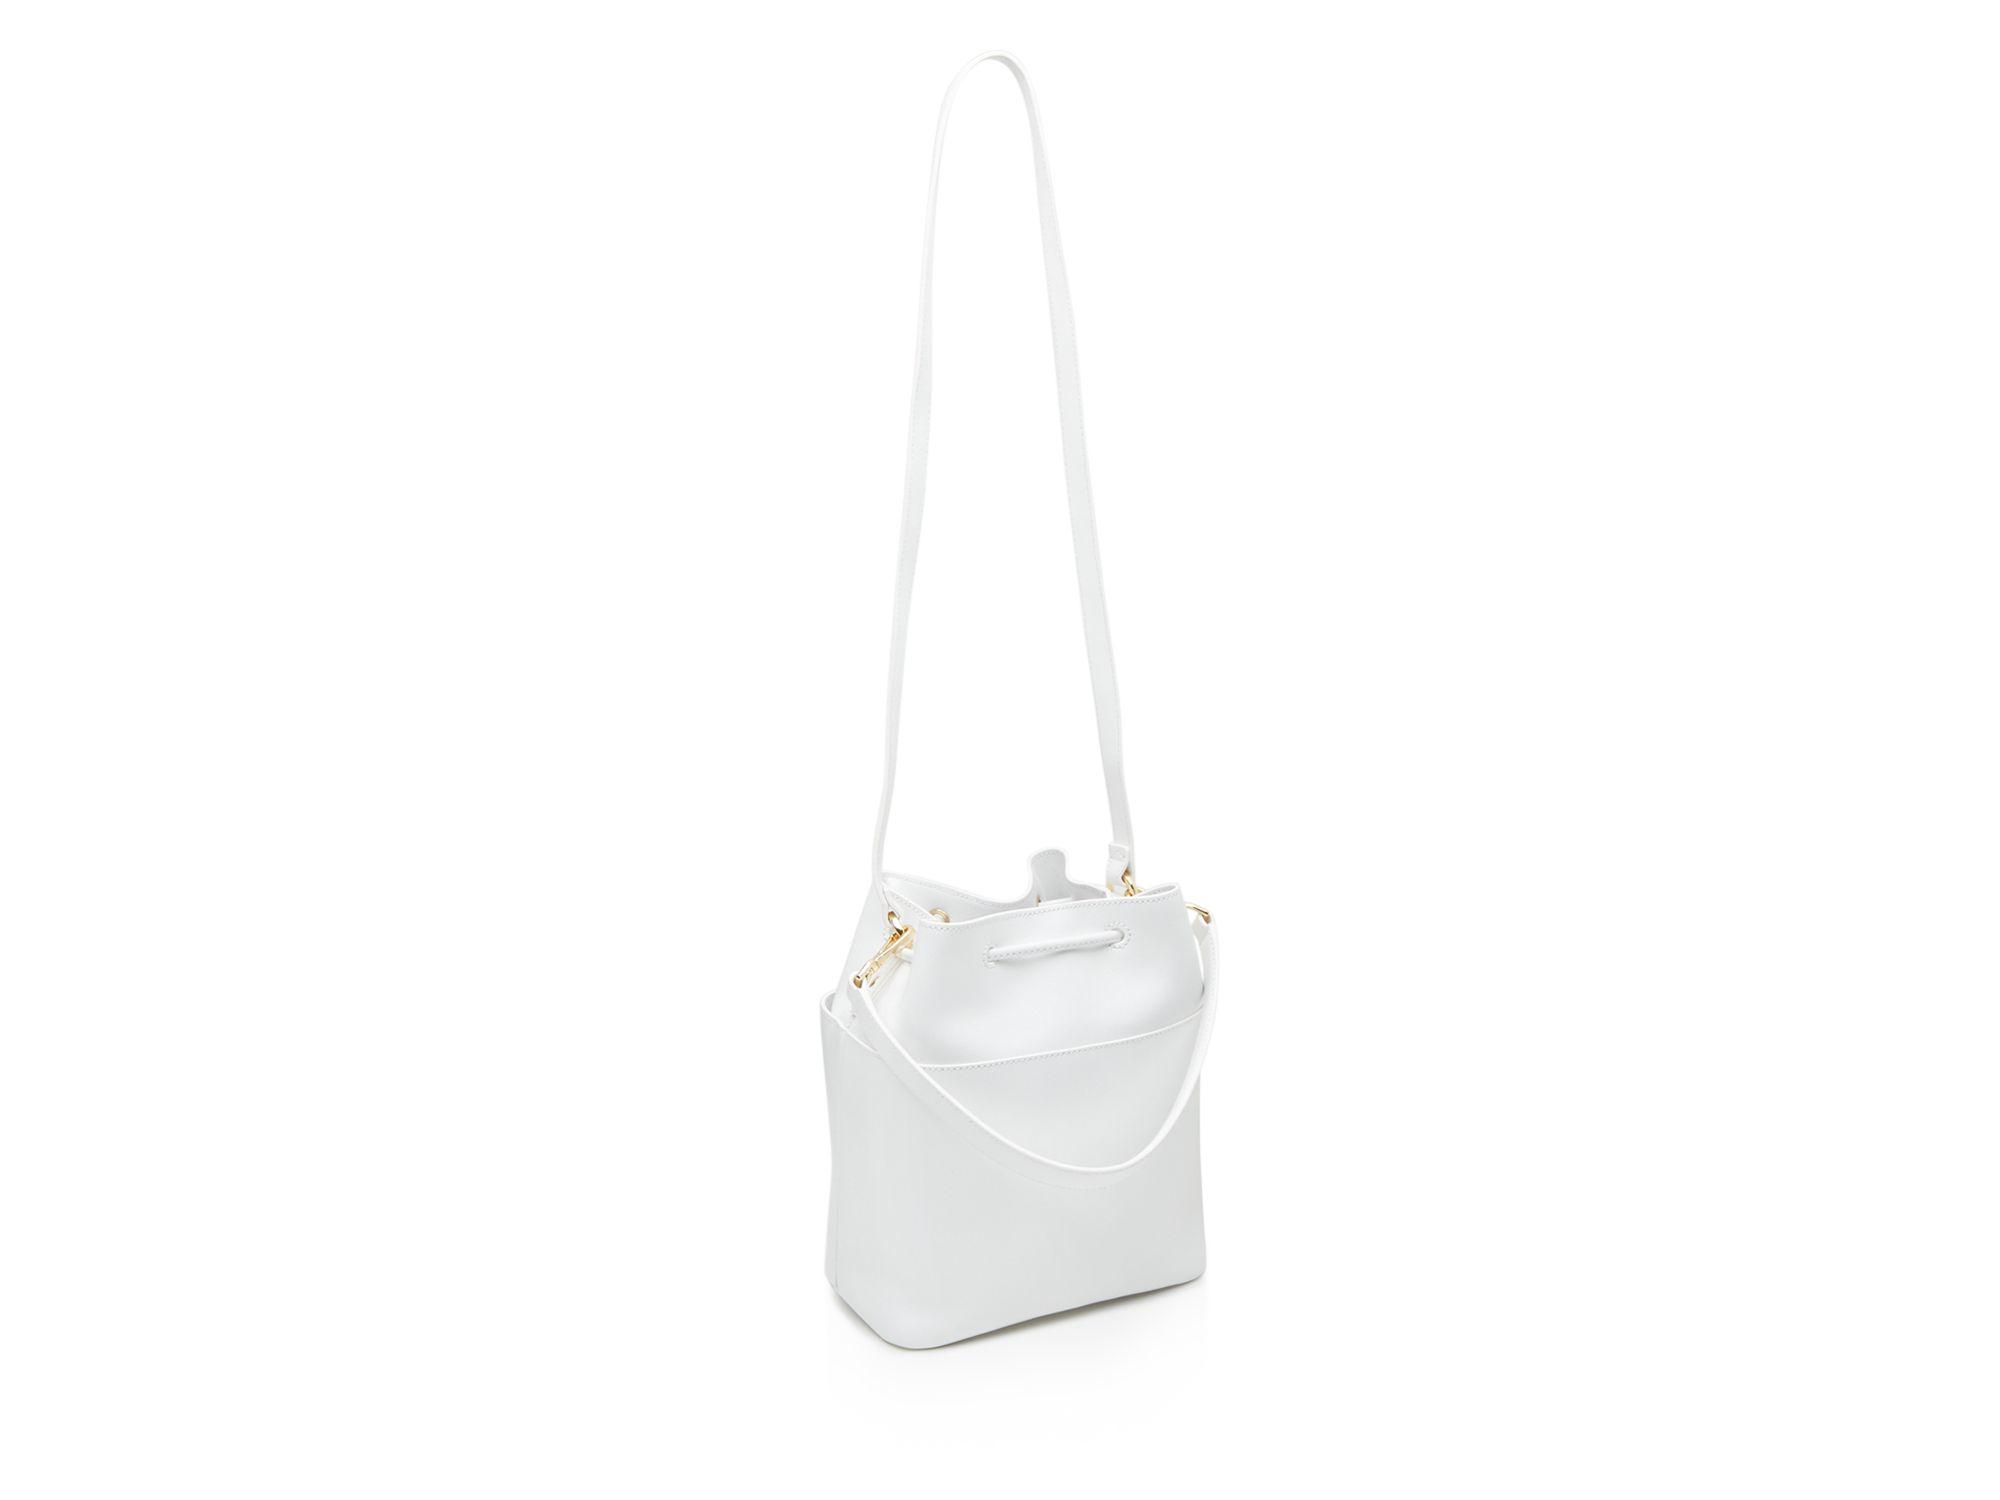 905c2d0781f38 Lyst - Ted Baker Large Adrene Metal Bar Bucket Bag in Black